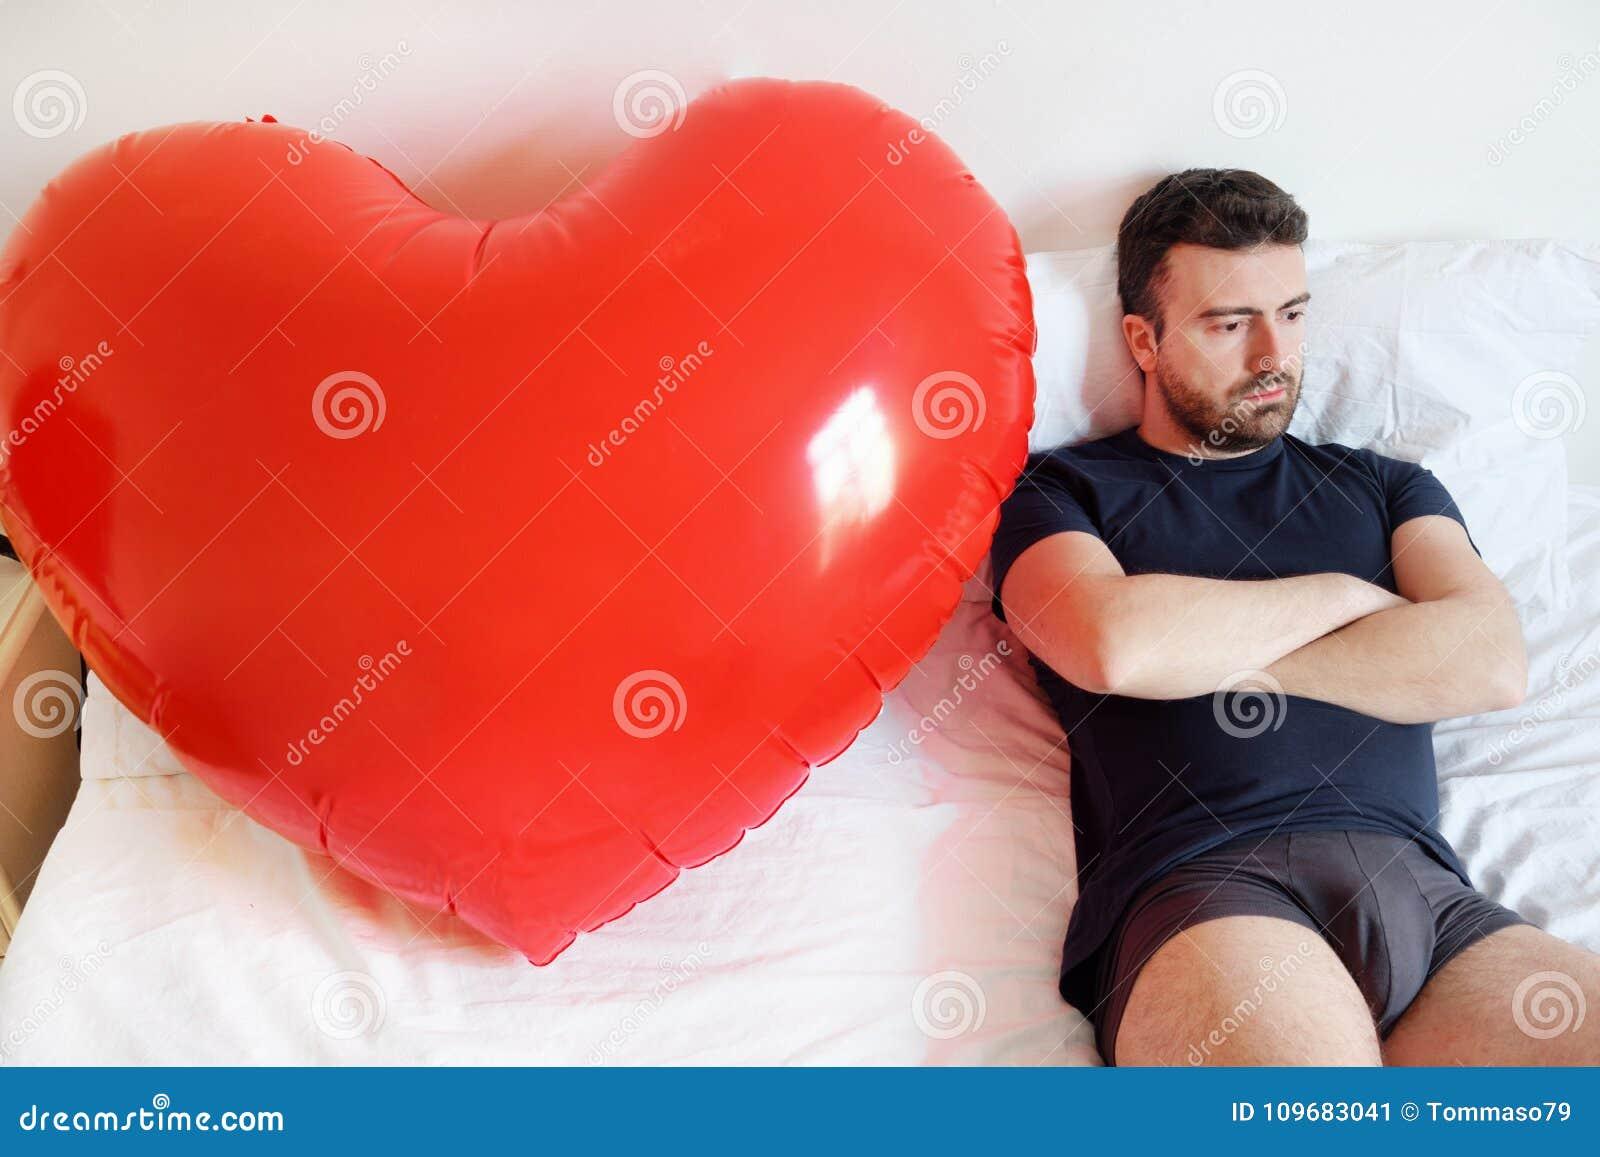 Sad man love pictures